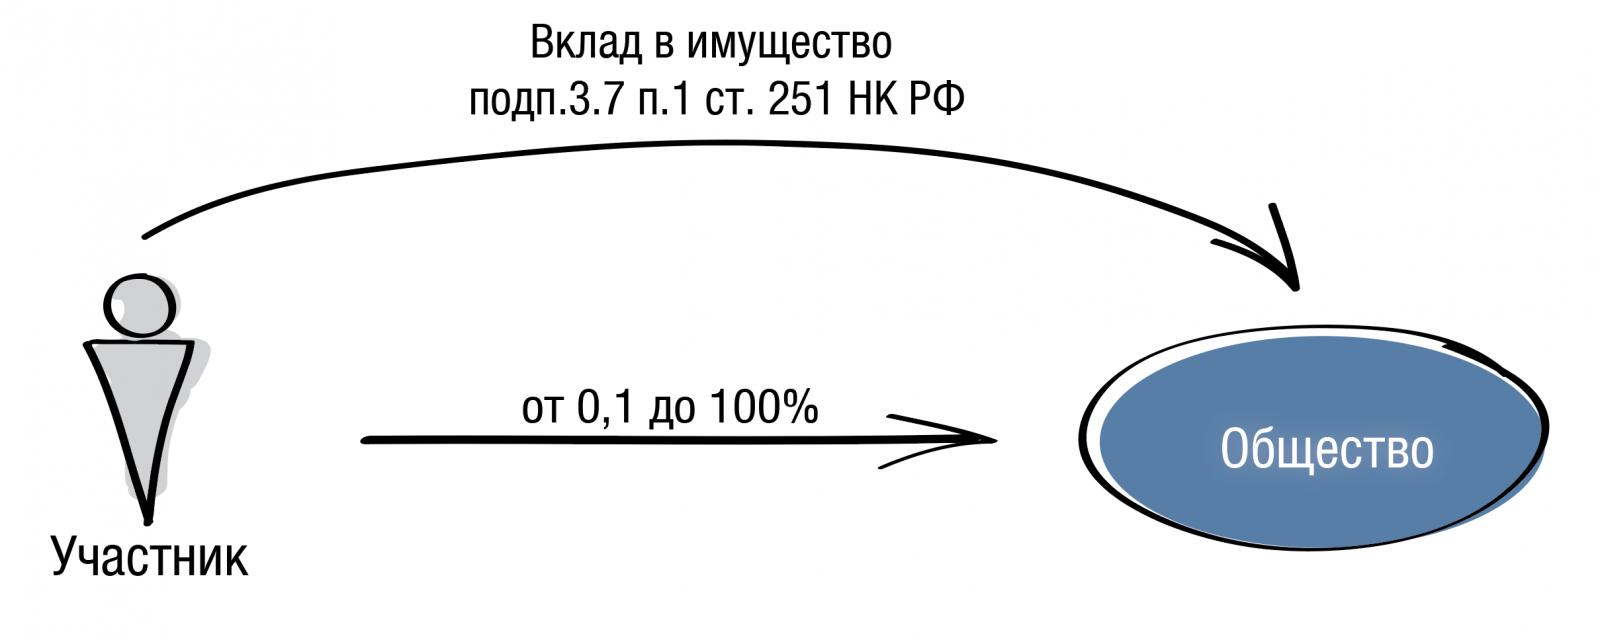 vklad_5.png